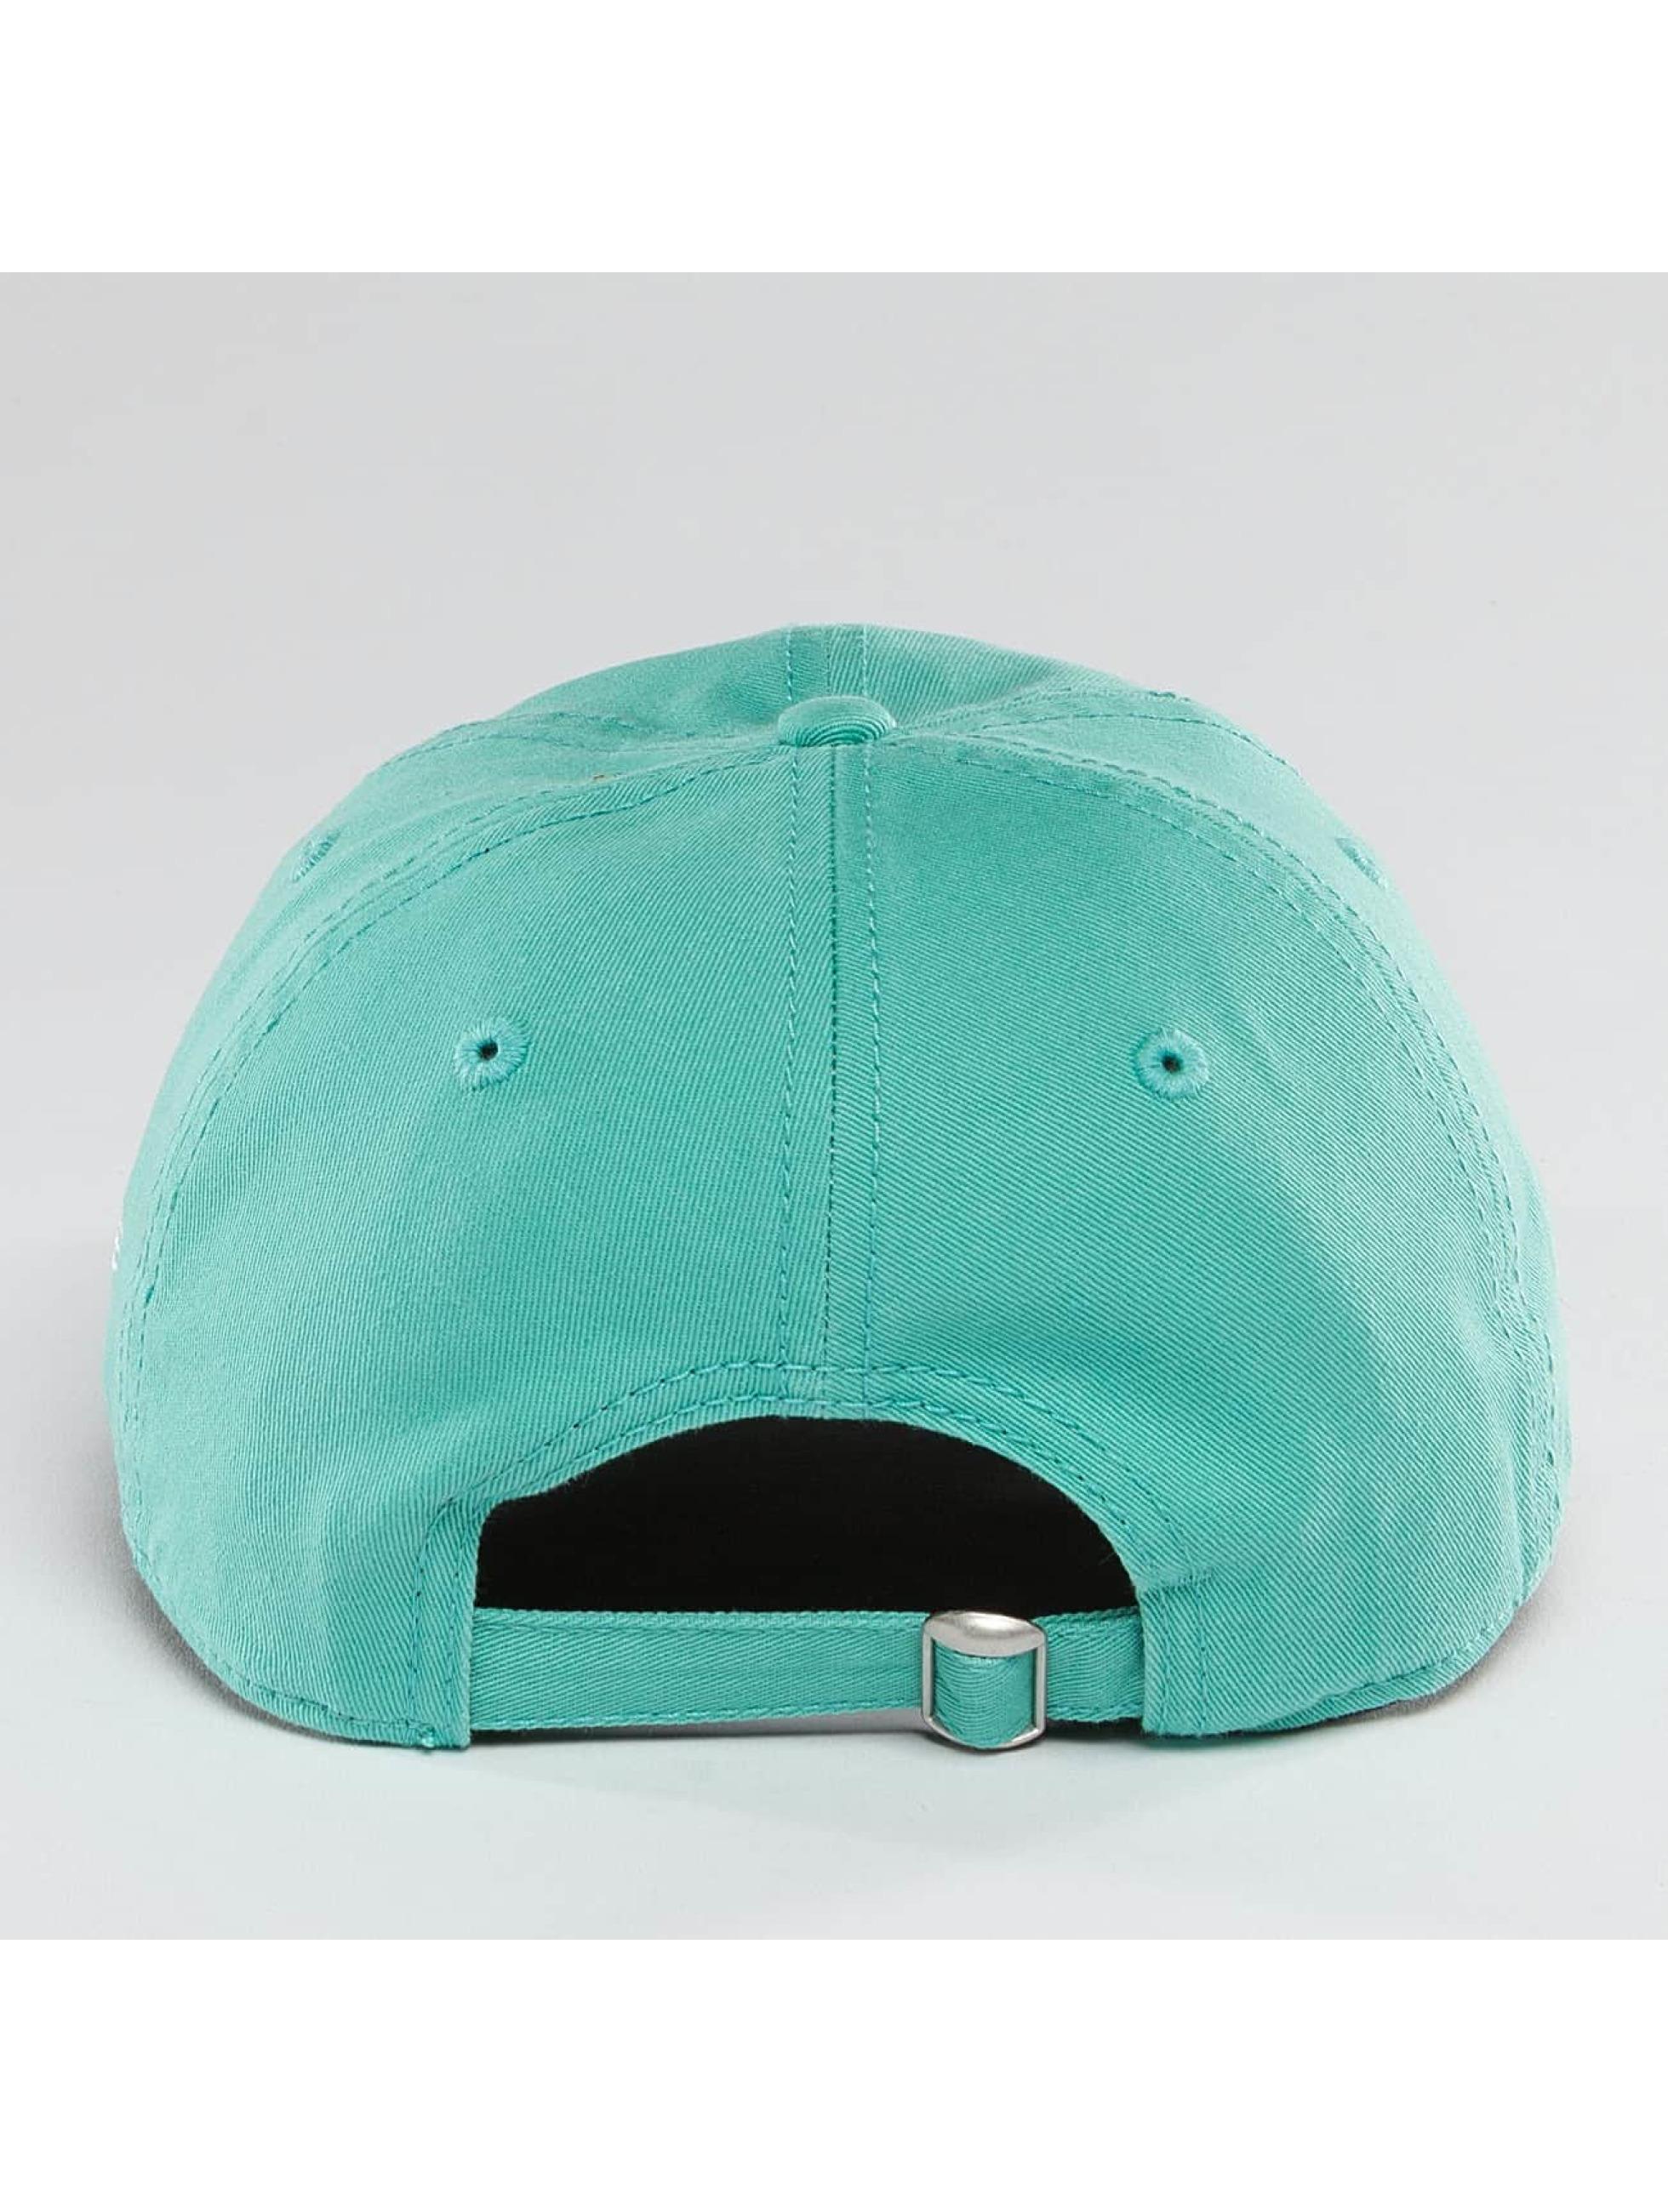 New Era Casquette Snapback & Strapback Pastel Micro LA Dodgers 9Twenty turquoise